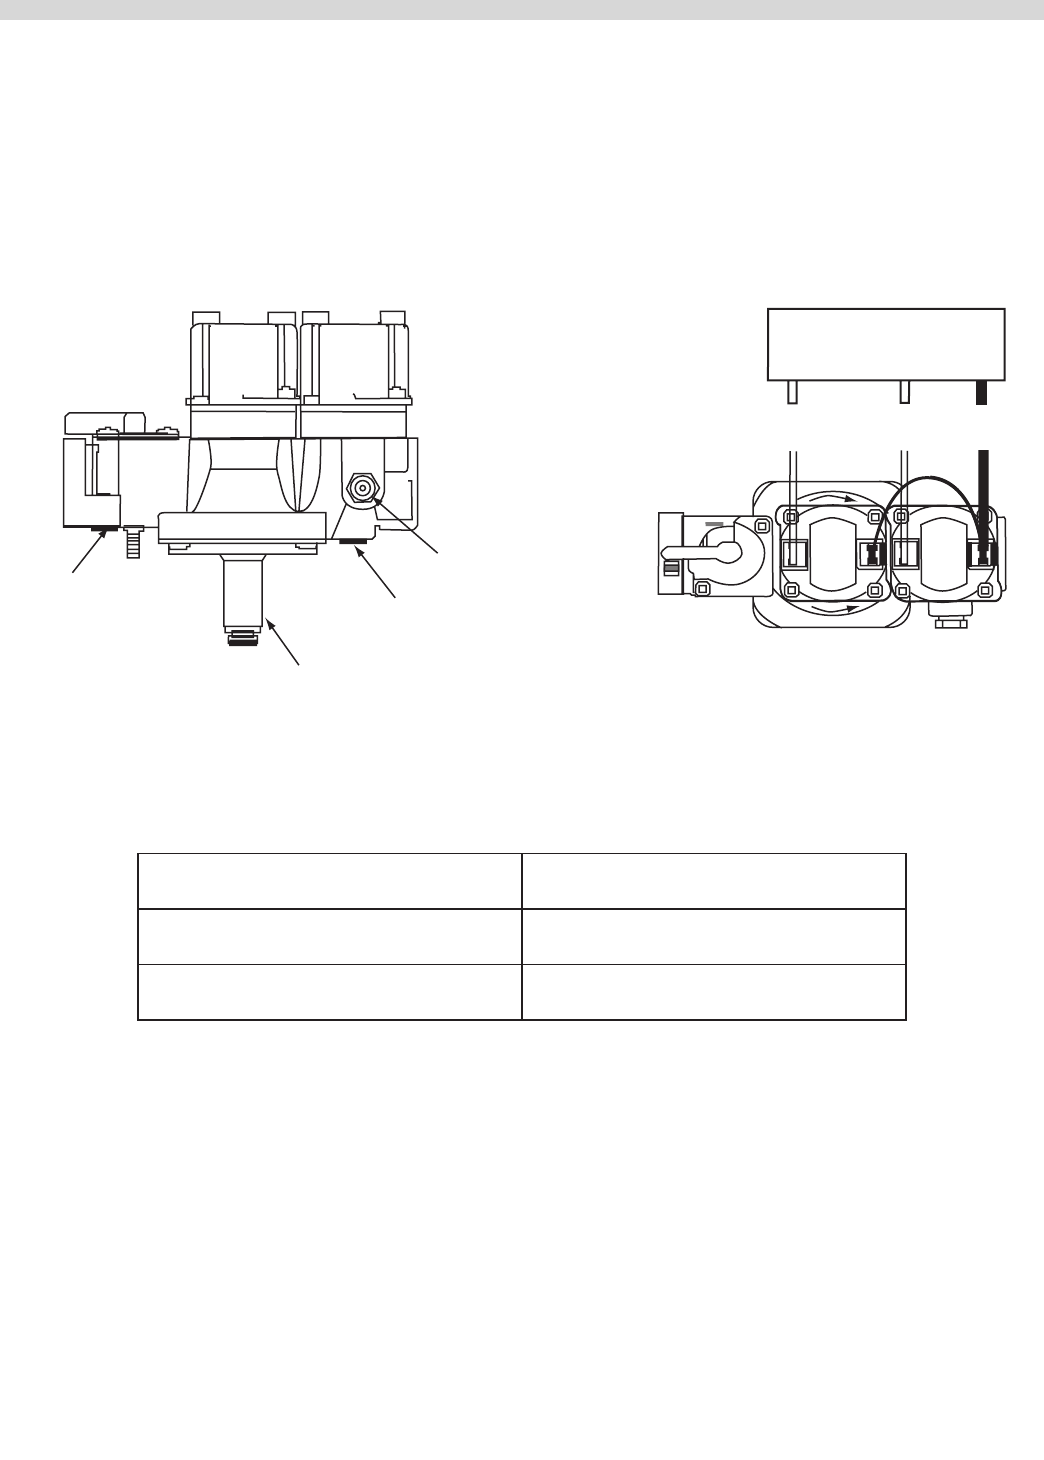 Garland Stove Wiring Diagram Schematics Schematic For Kitchen 200 Mco Convection Oven Gas Valve Ge Profile Range